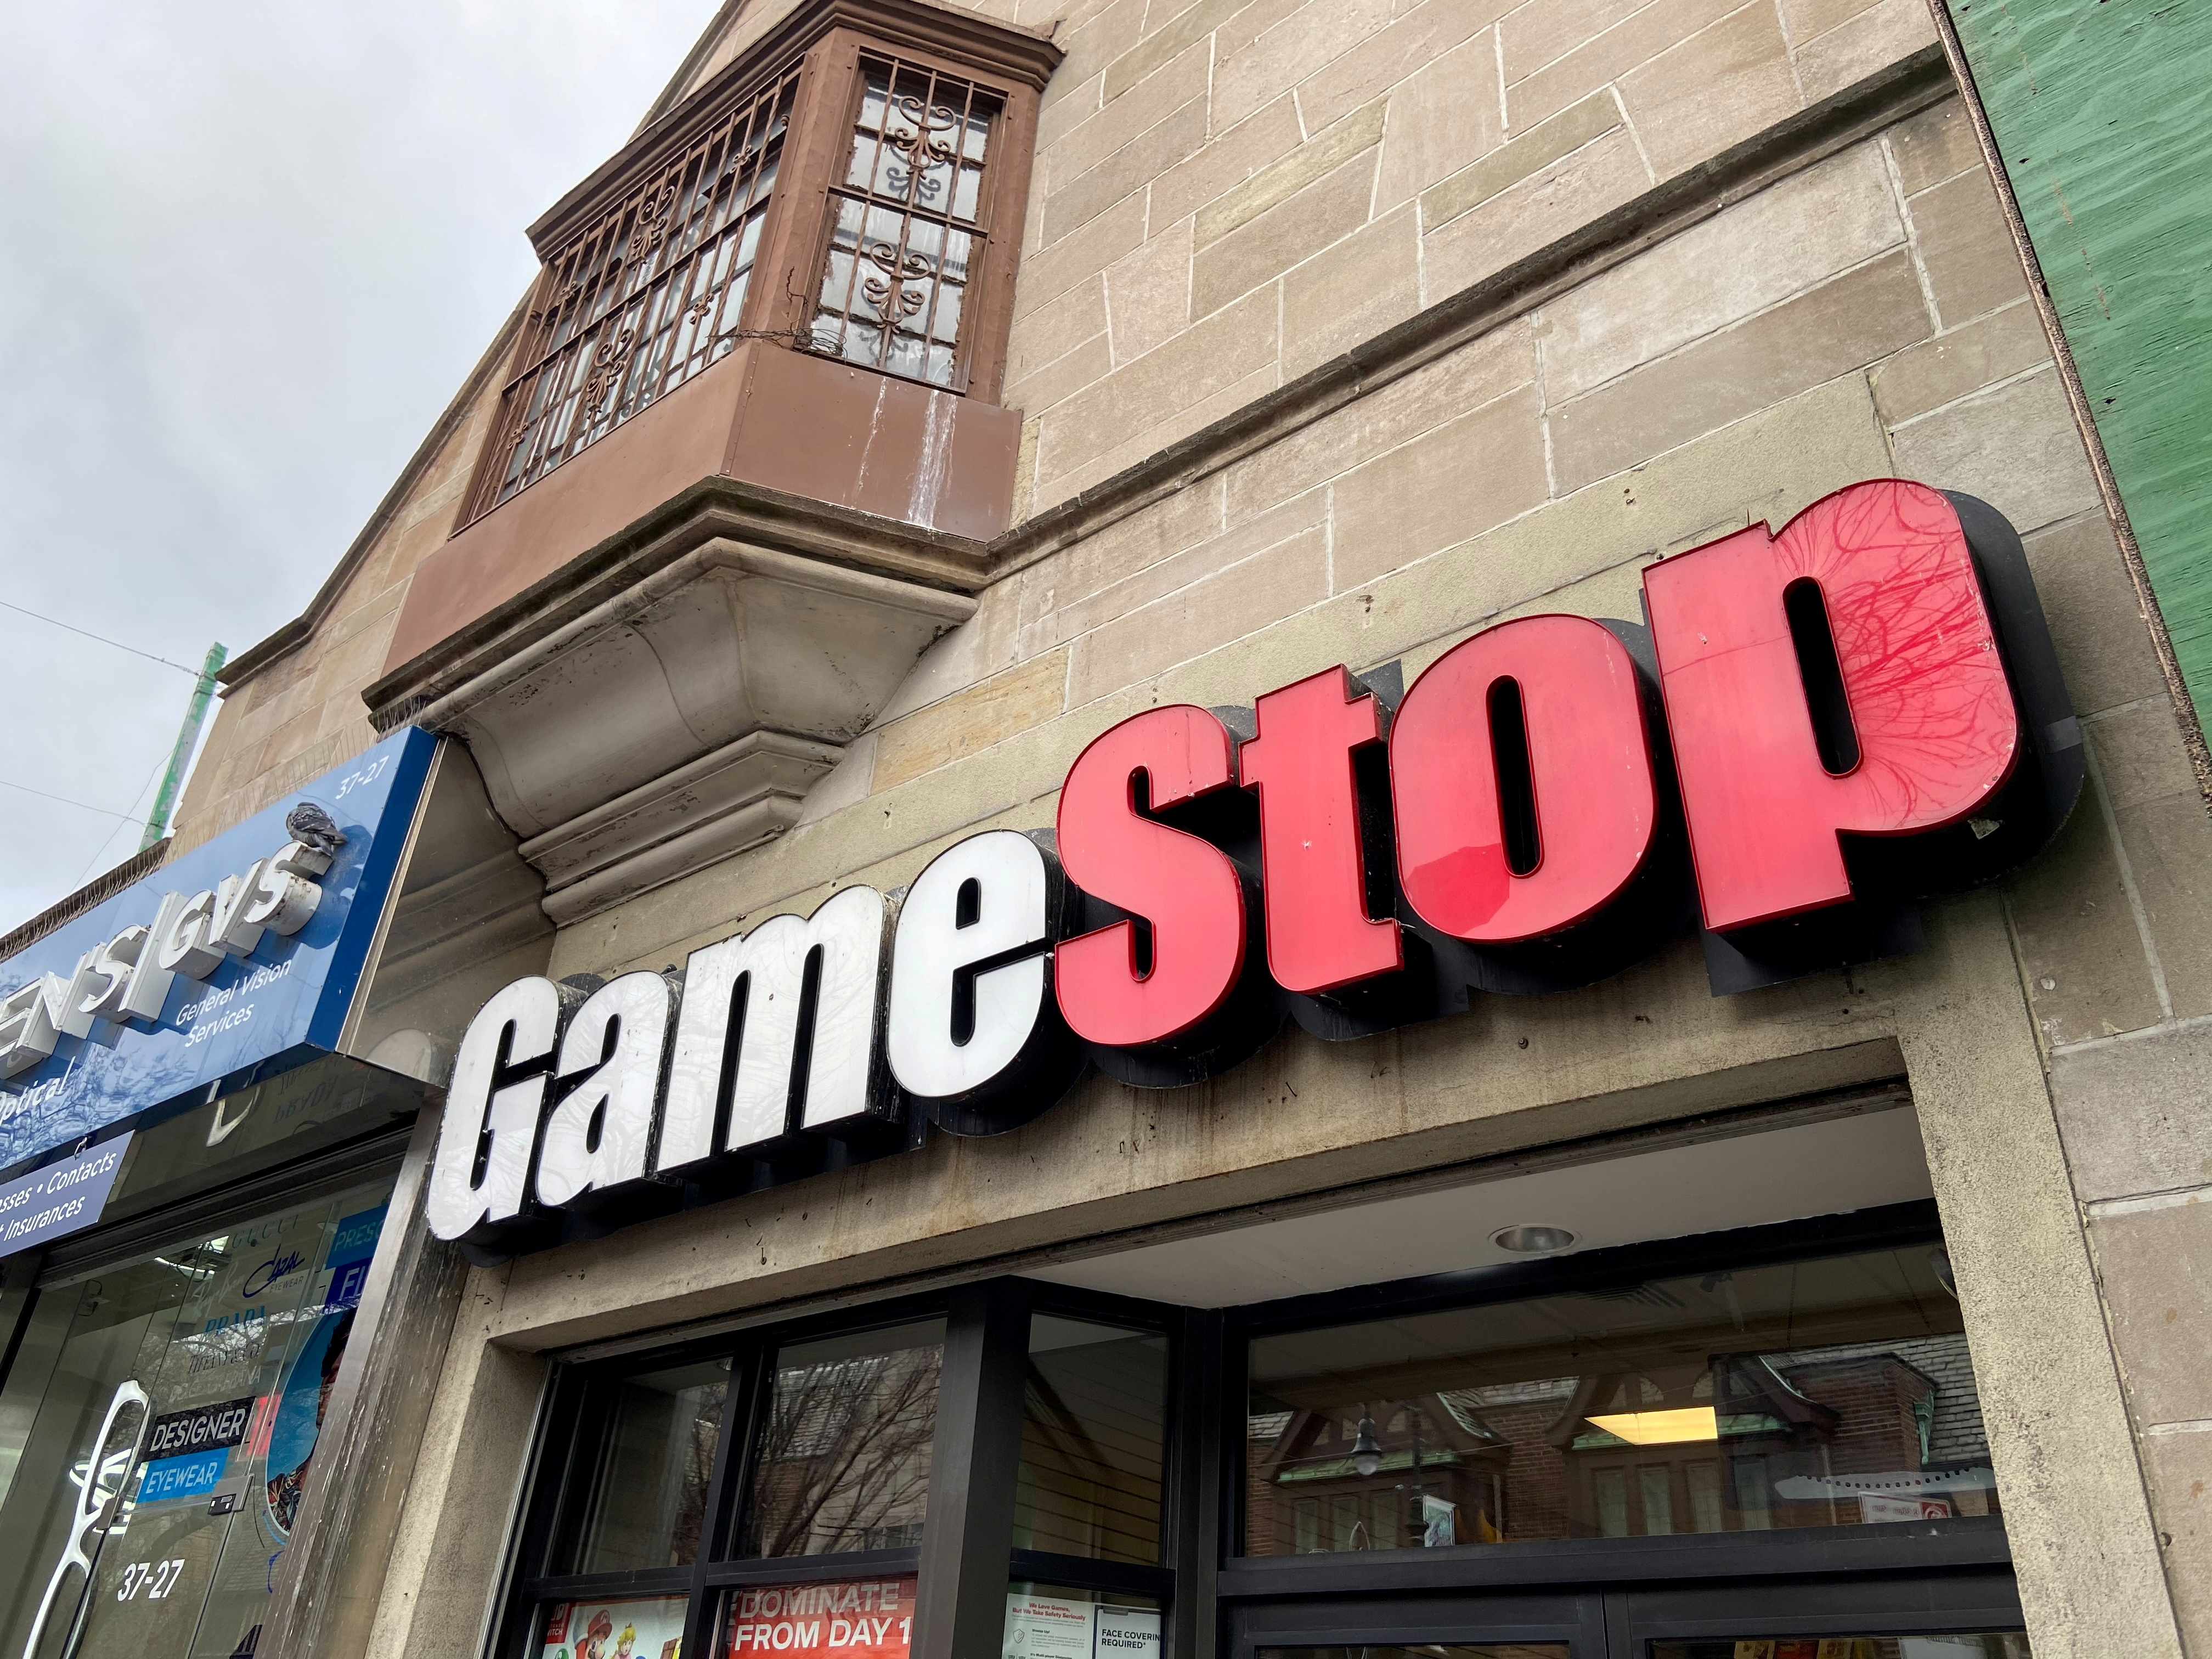 A GameStop store is seen in the Jackson Heights neighborhood of New York City, New York, U.S. January 27, 2021. Picture taken January 27, 2021. REUTERS/Nick Zieminski/File Photo